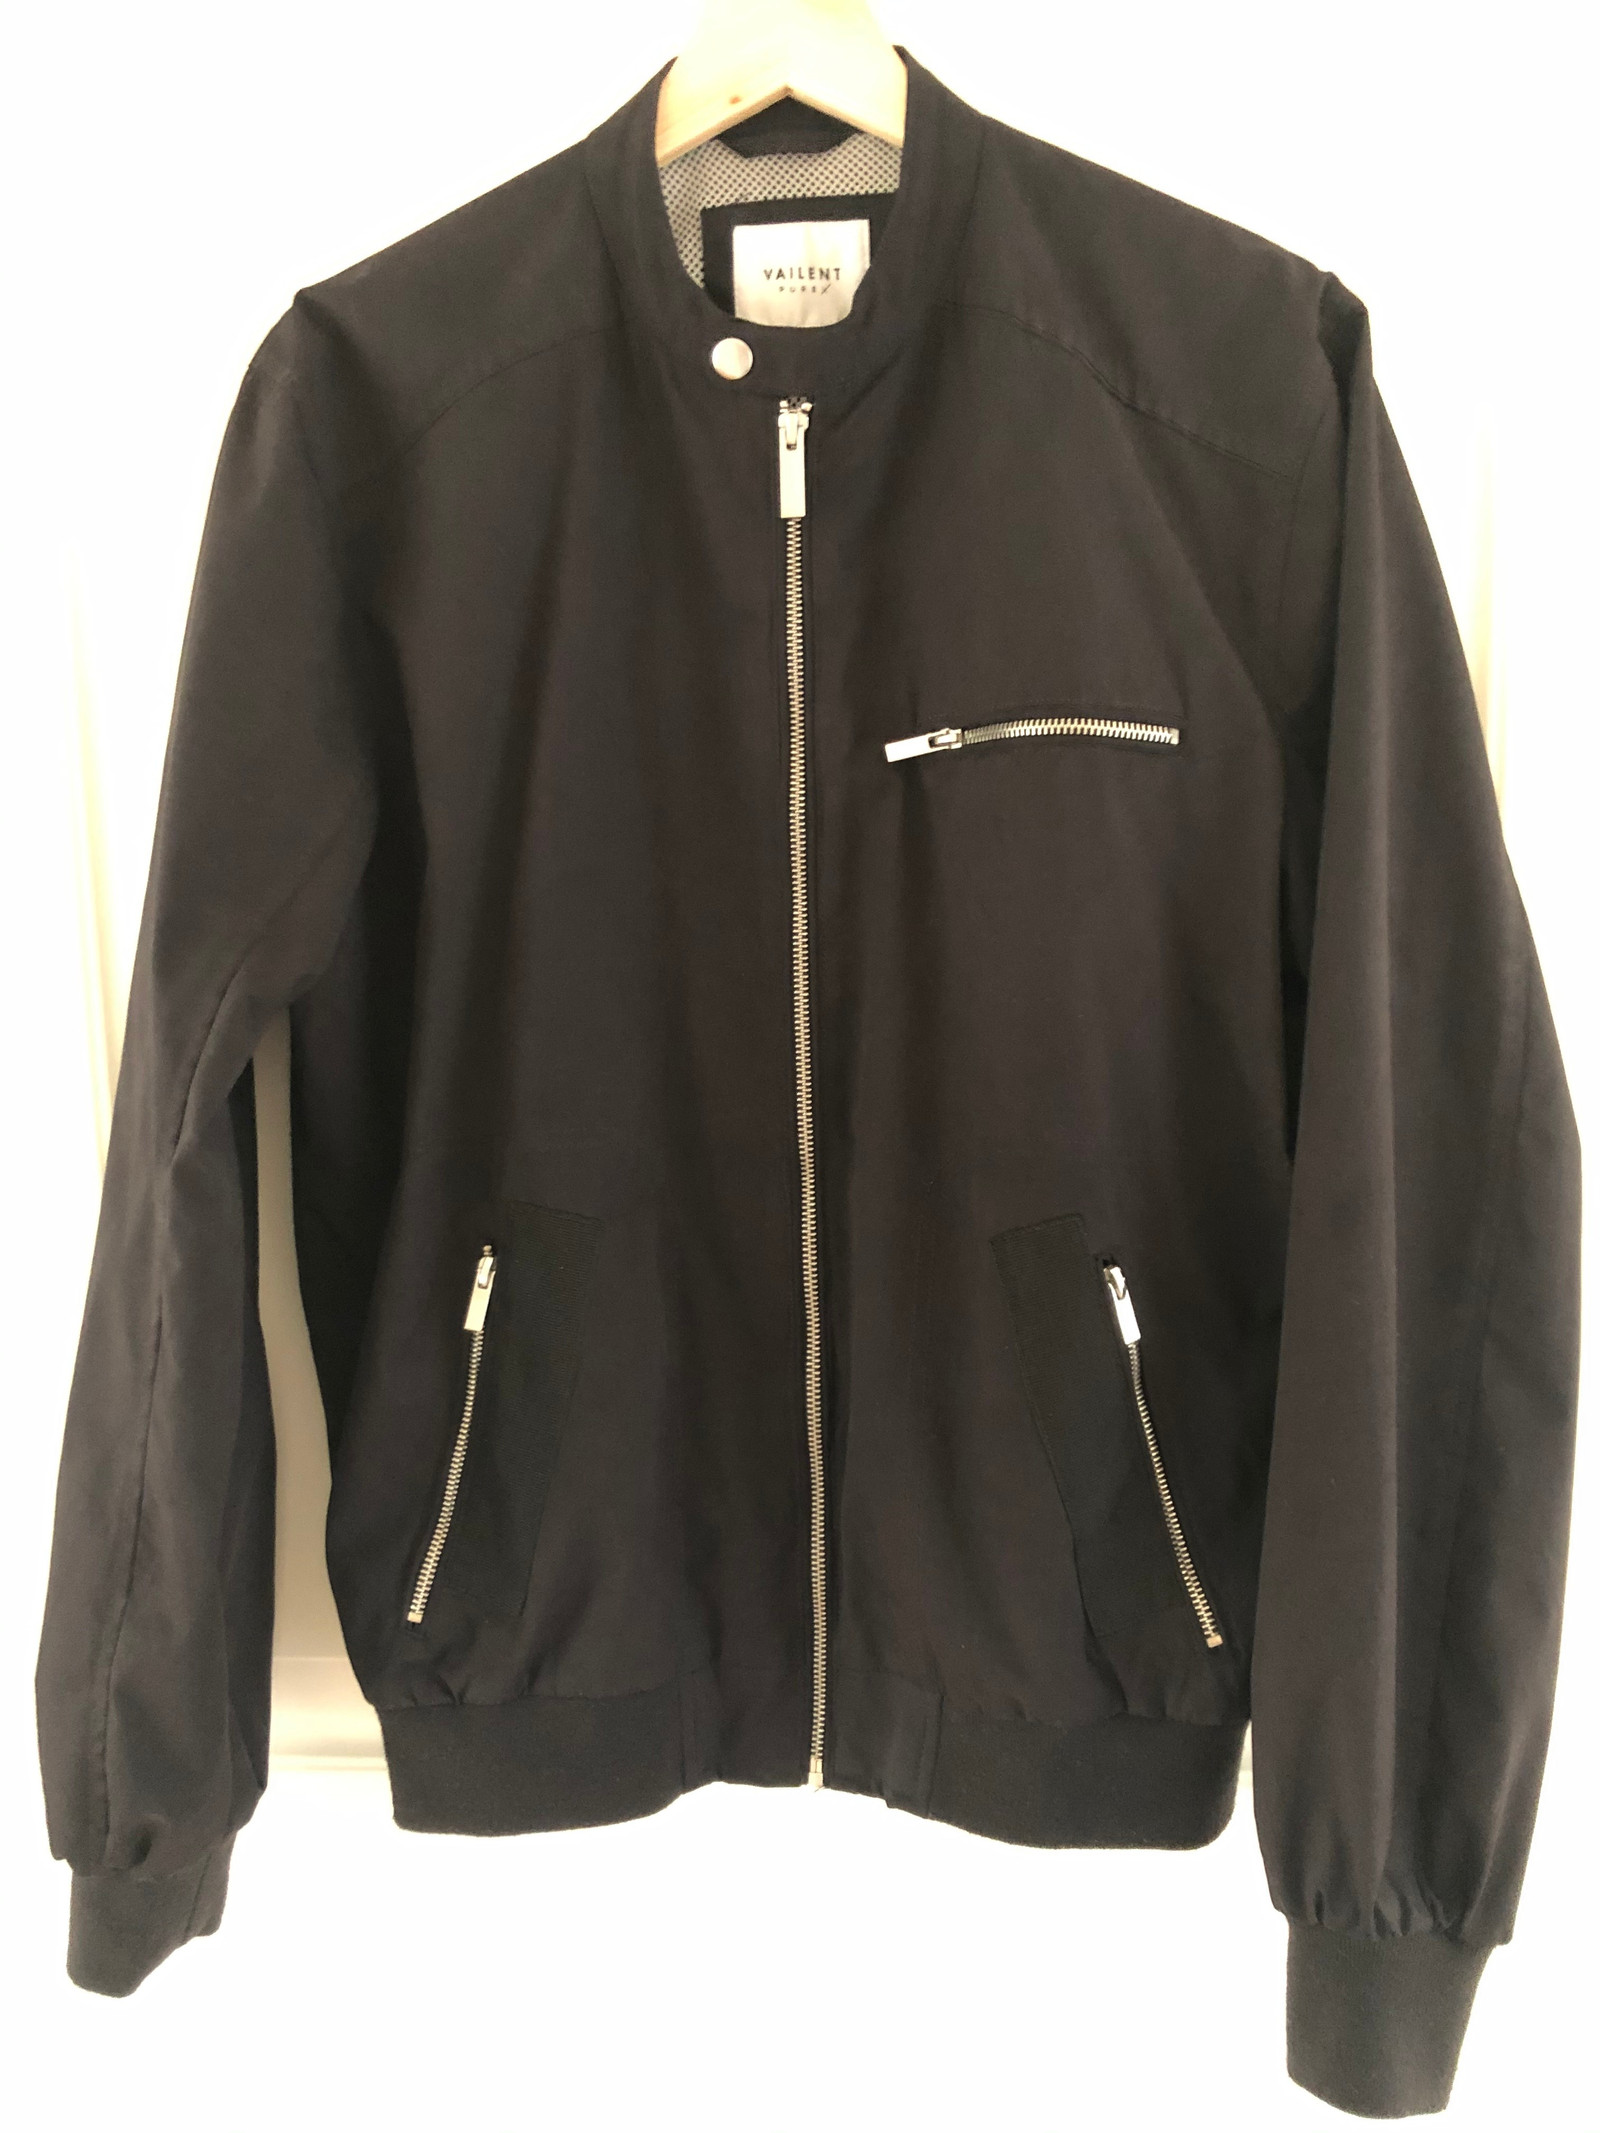 Vailent Pure x jakke til herre | FINN.no